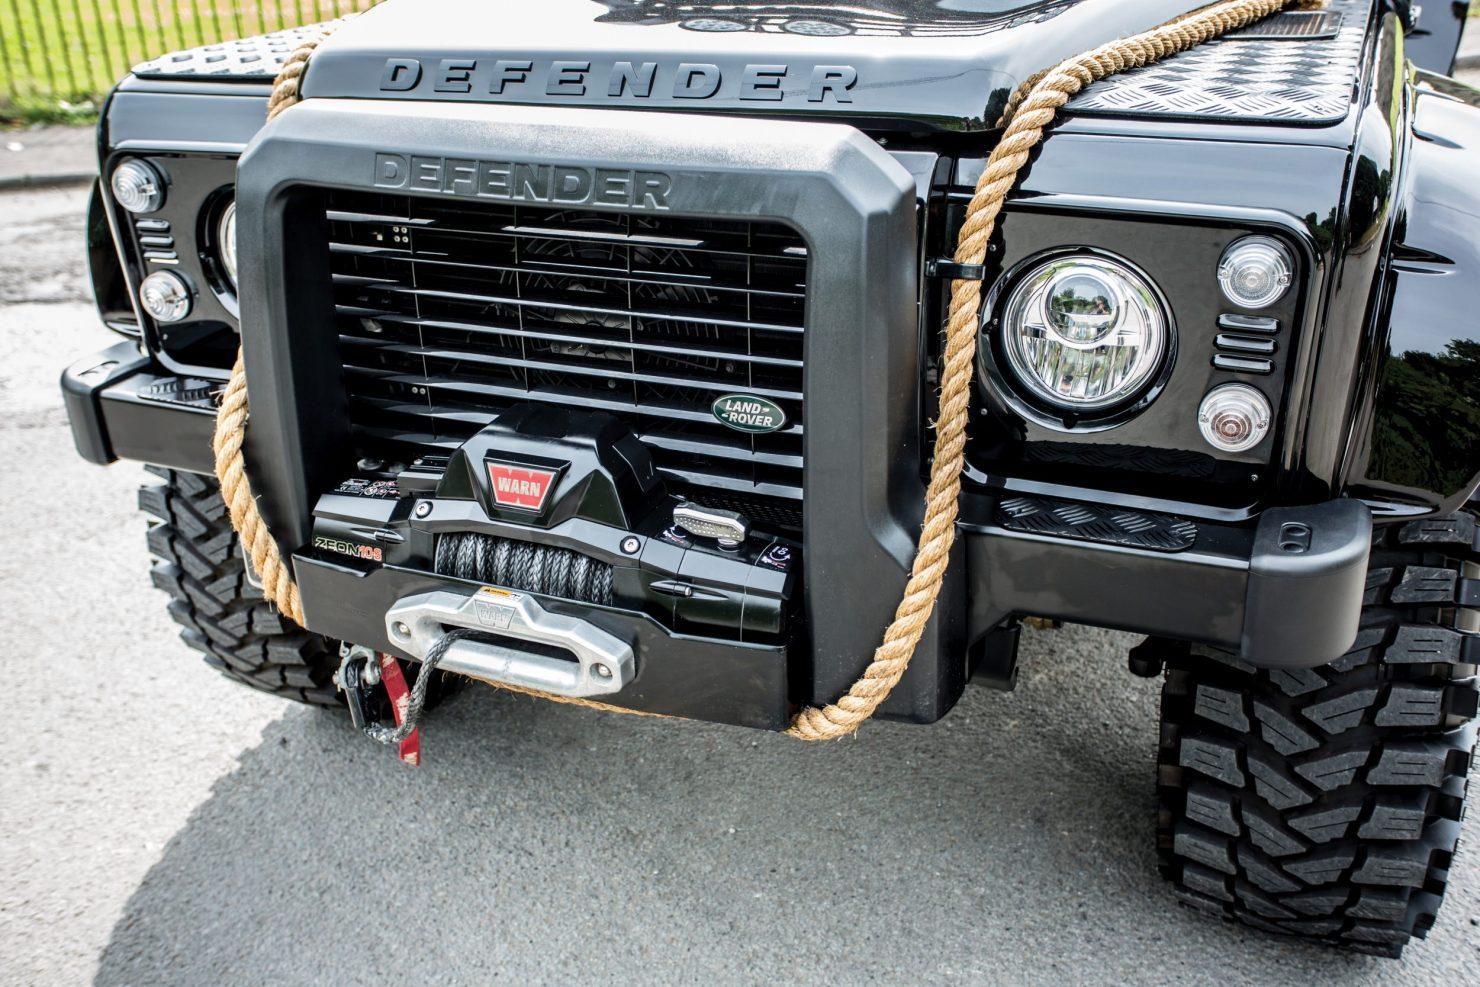 james bond spectre land rover defender svx 5 1480x987 - Ex-James Bond Spectre - Land Rover Defender SVX